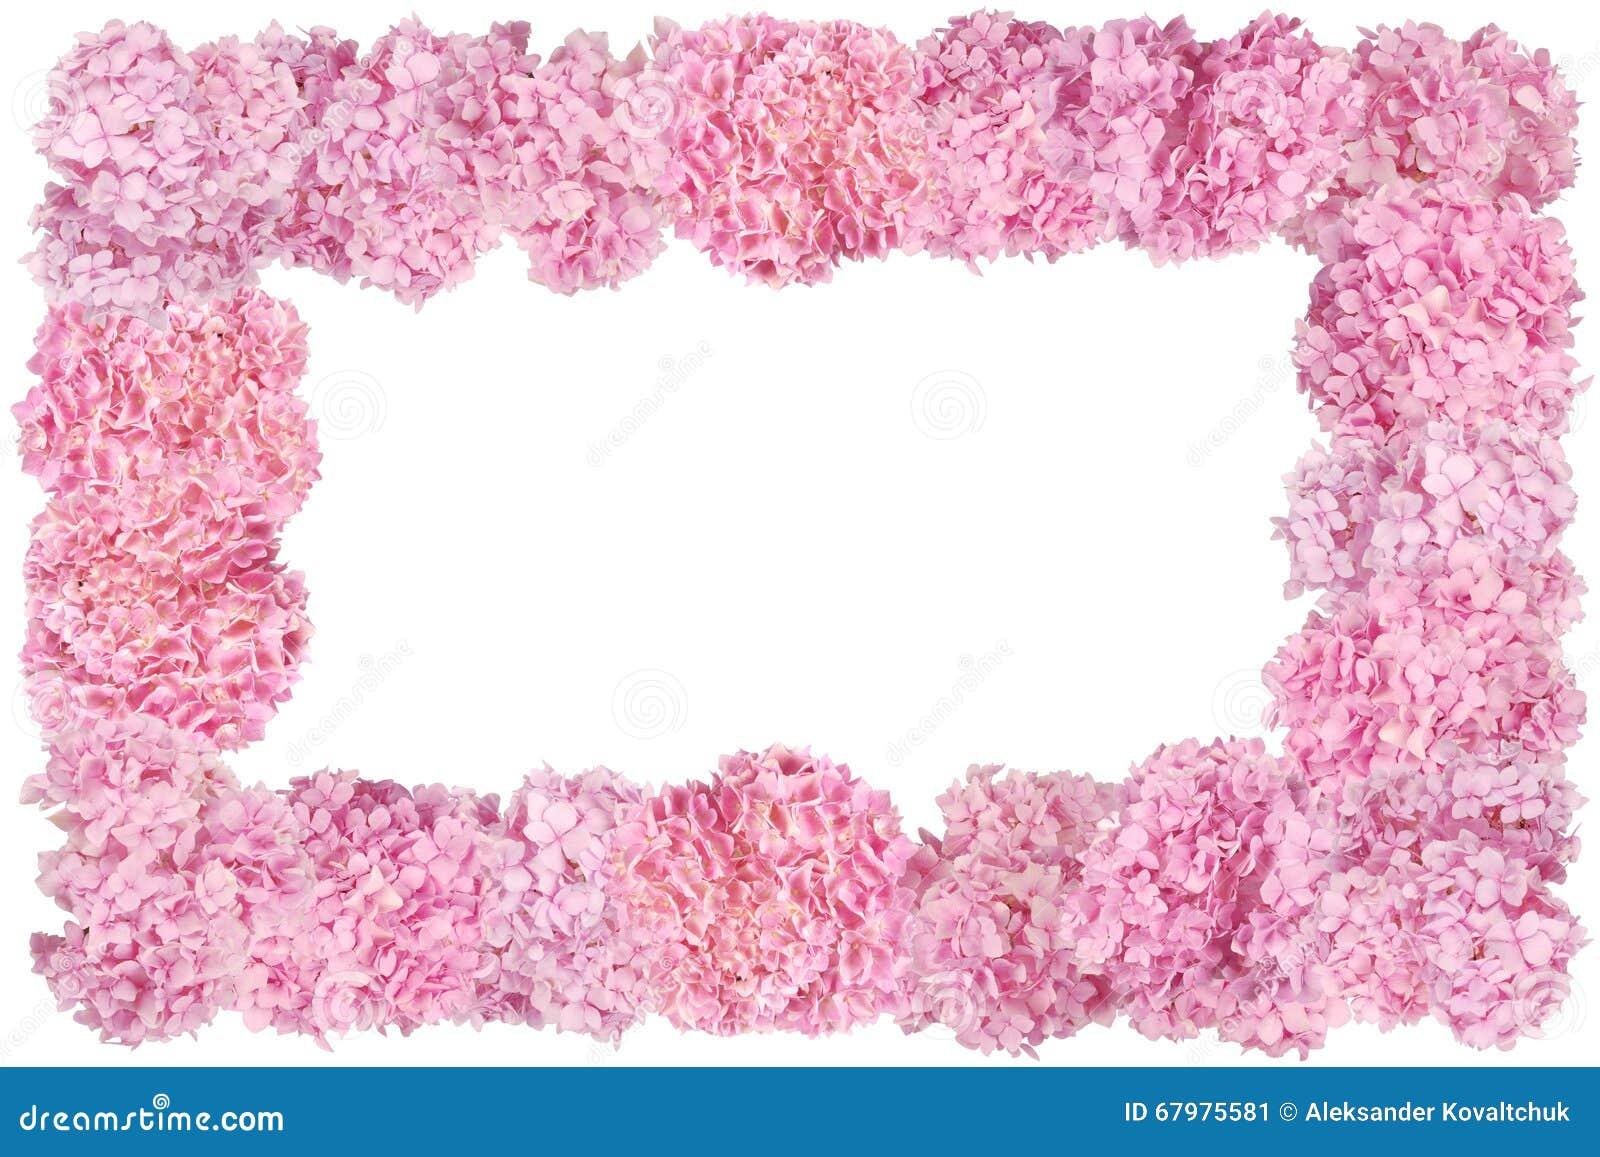 beau cadre rose de fleur d 39 hortensias image stock image du ornement pastel 67975581. Black Bedroom Furniture Sets. Home Design Ideas